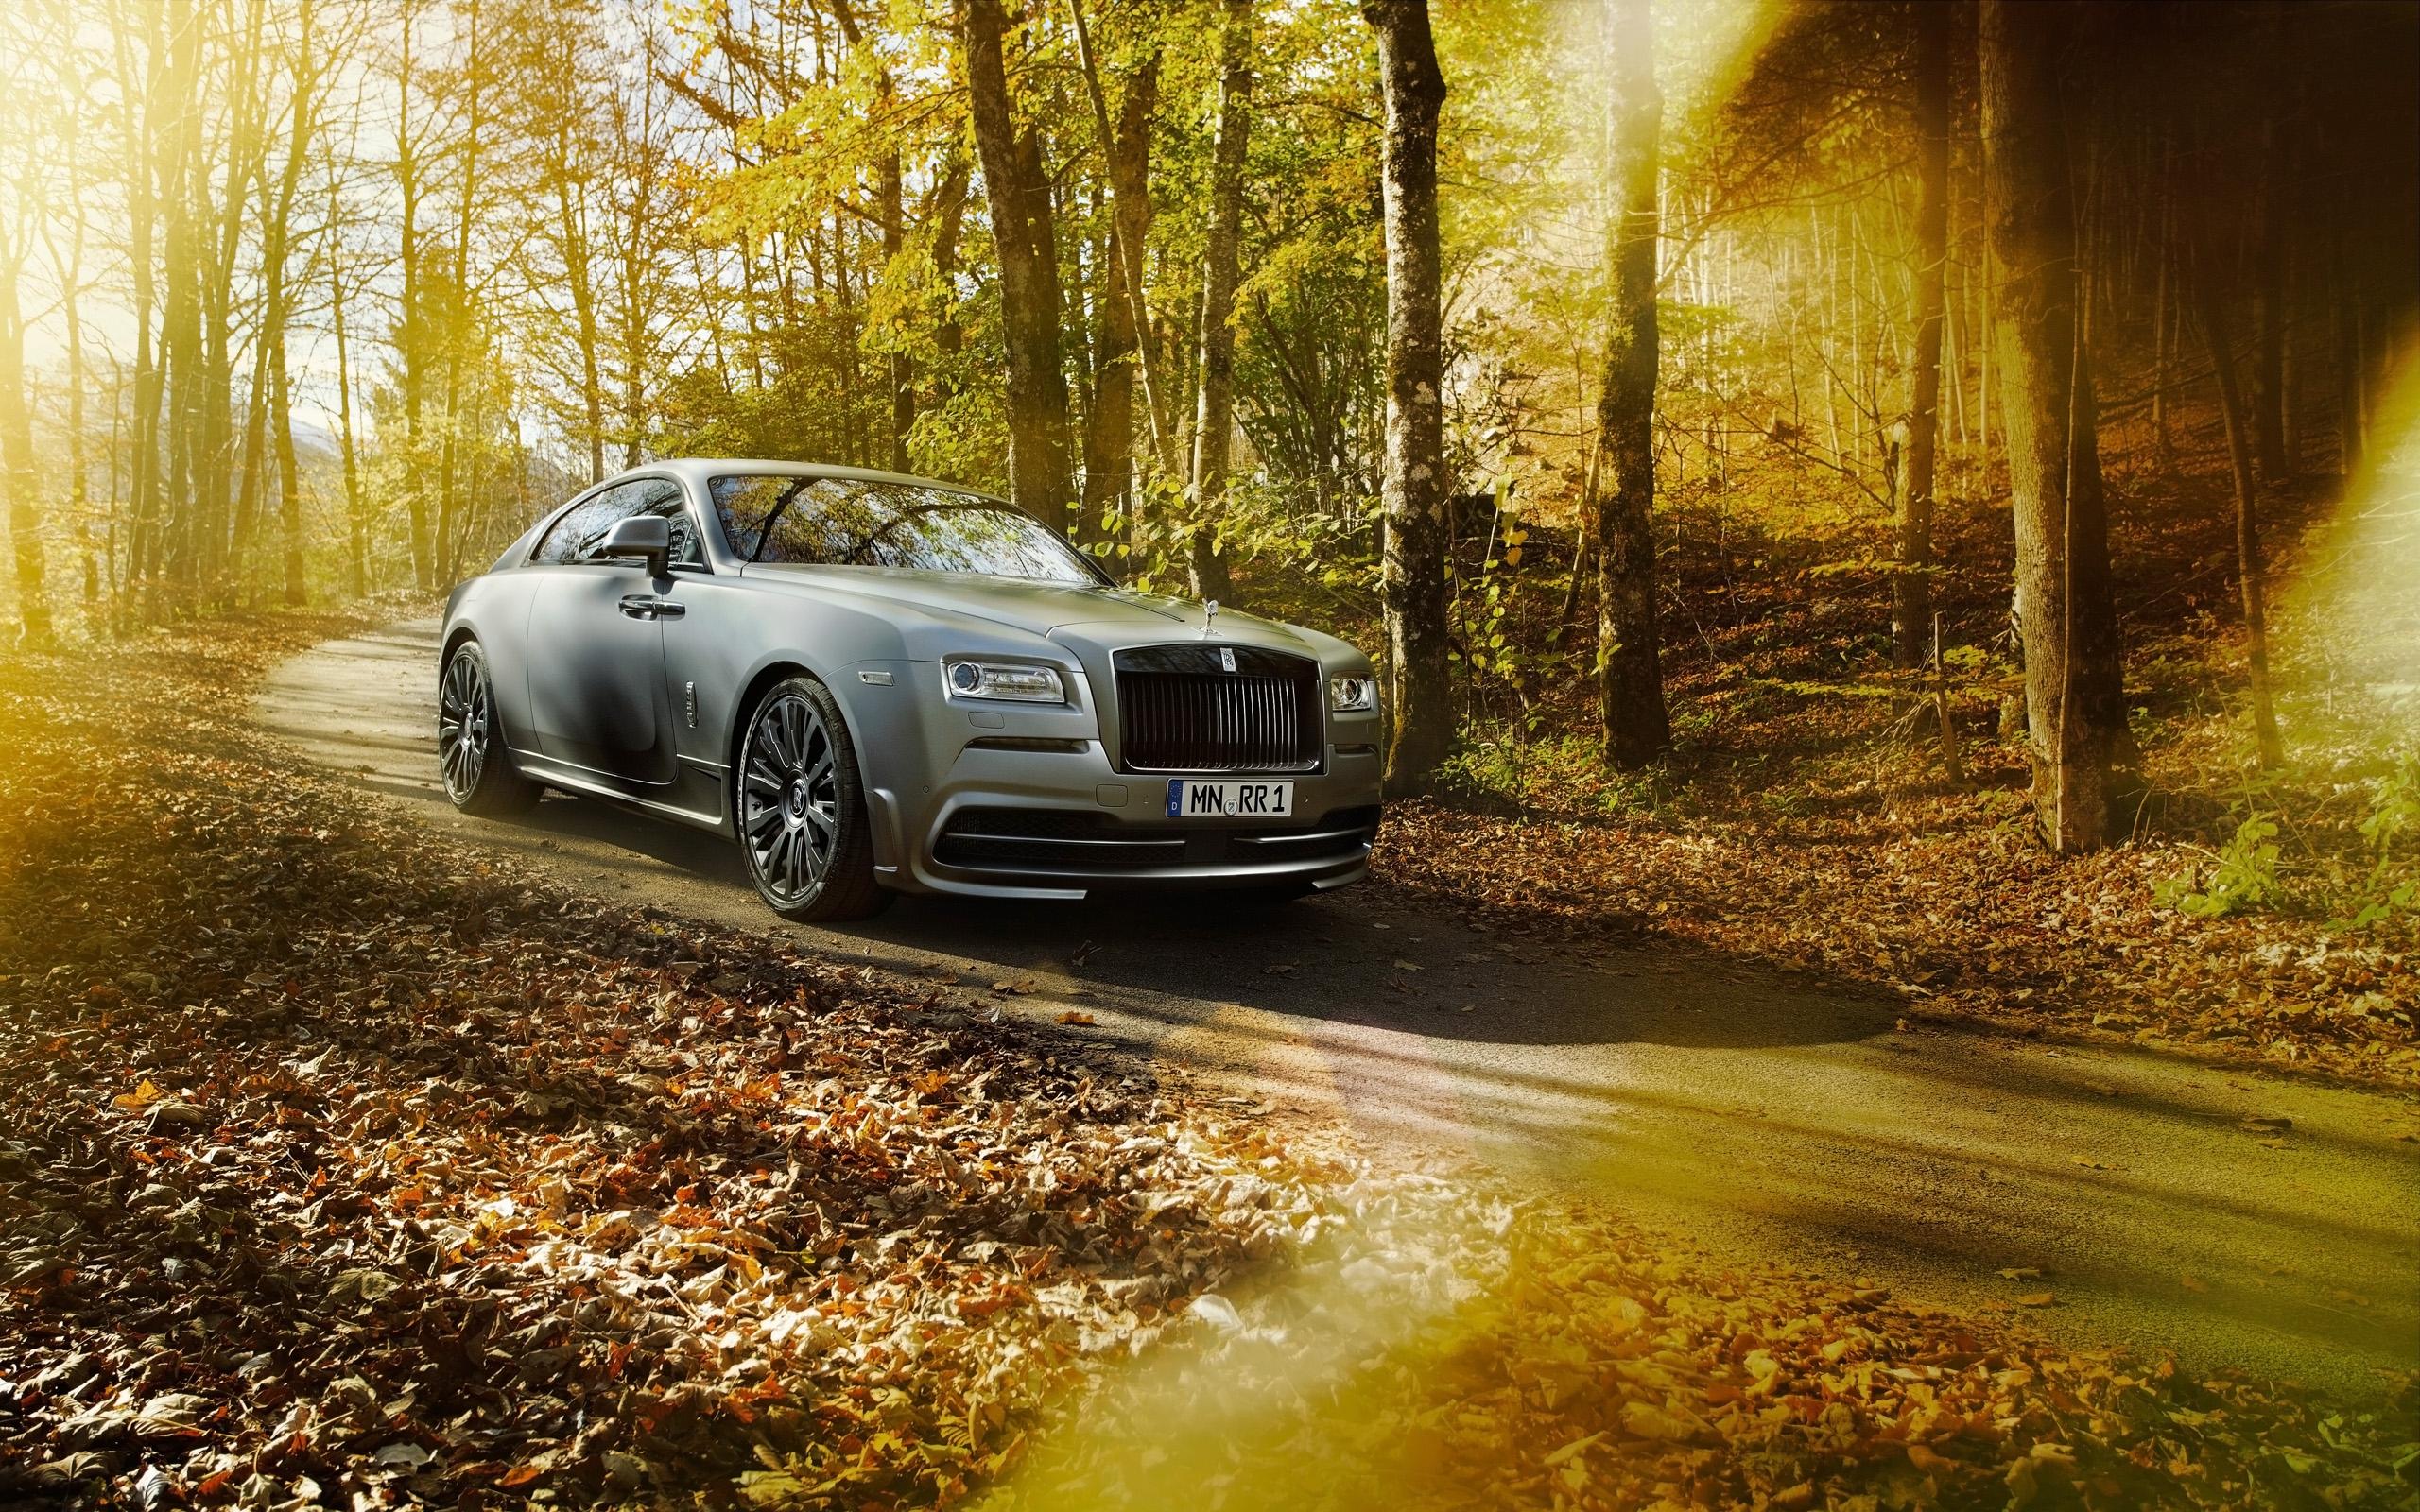 HD Wallpapers Spofec Rolls Royce Wraith 2014